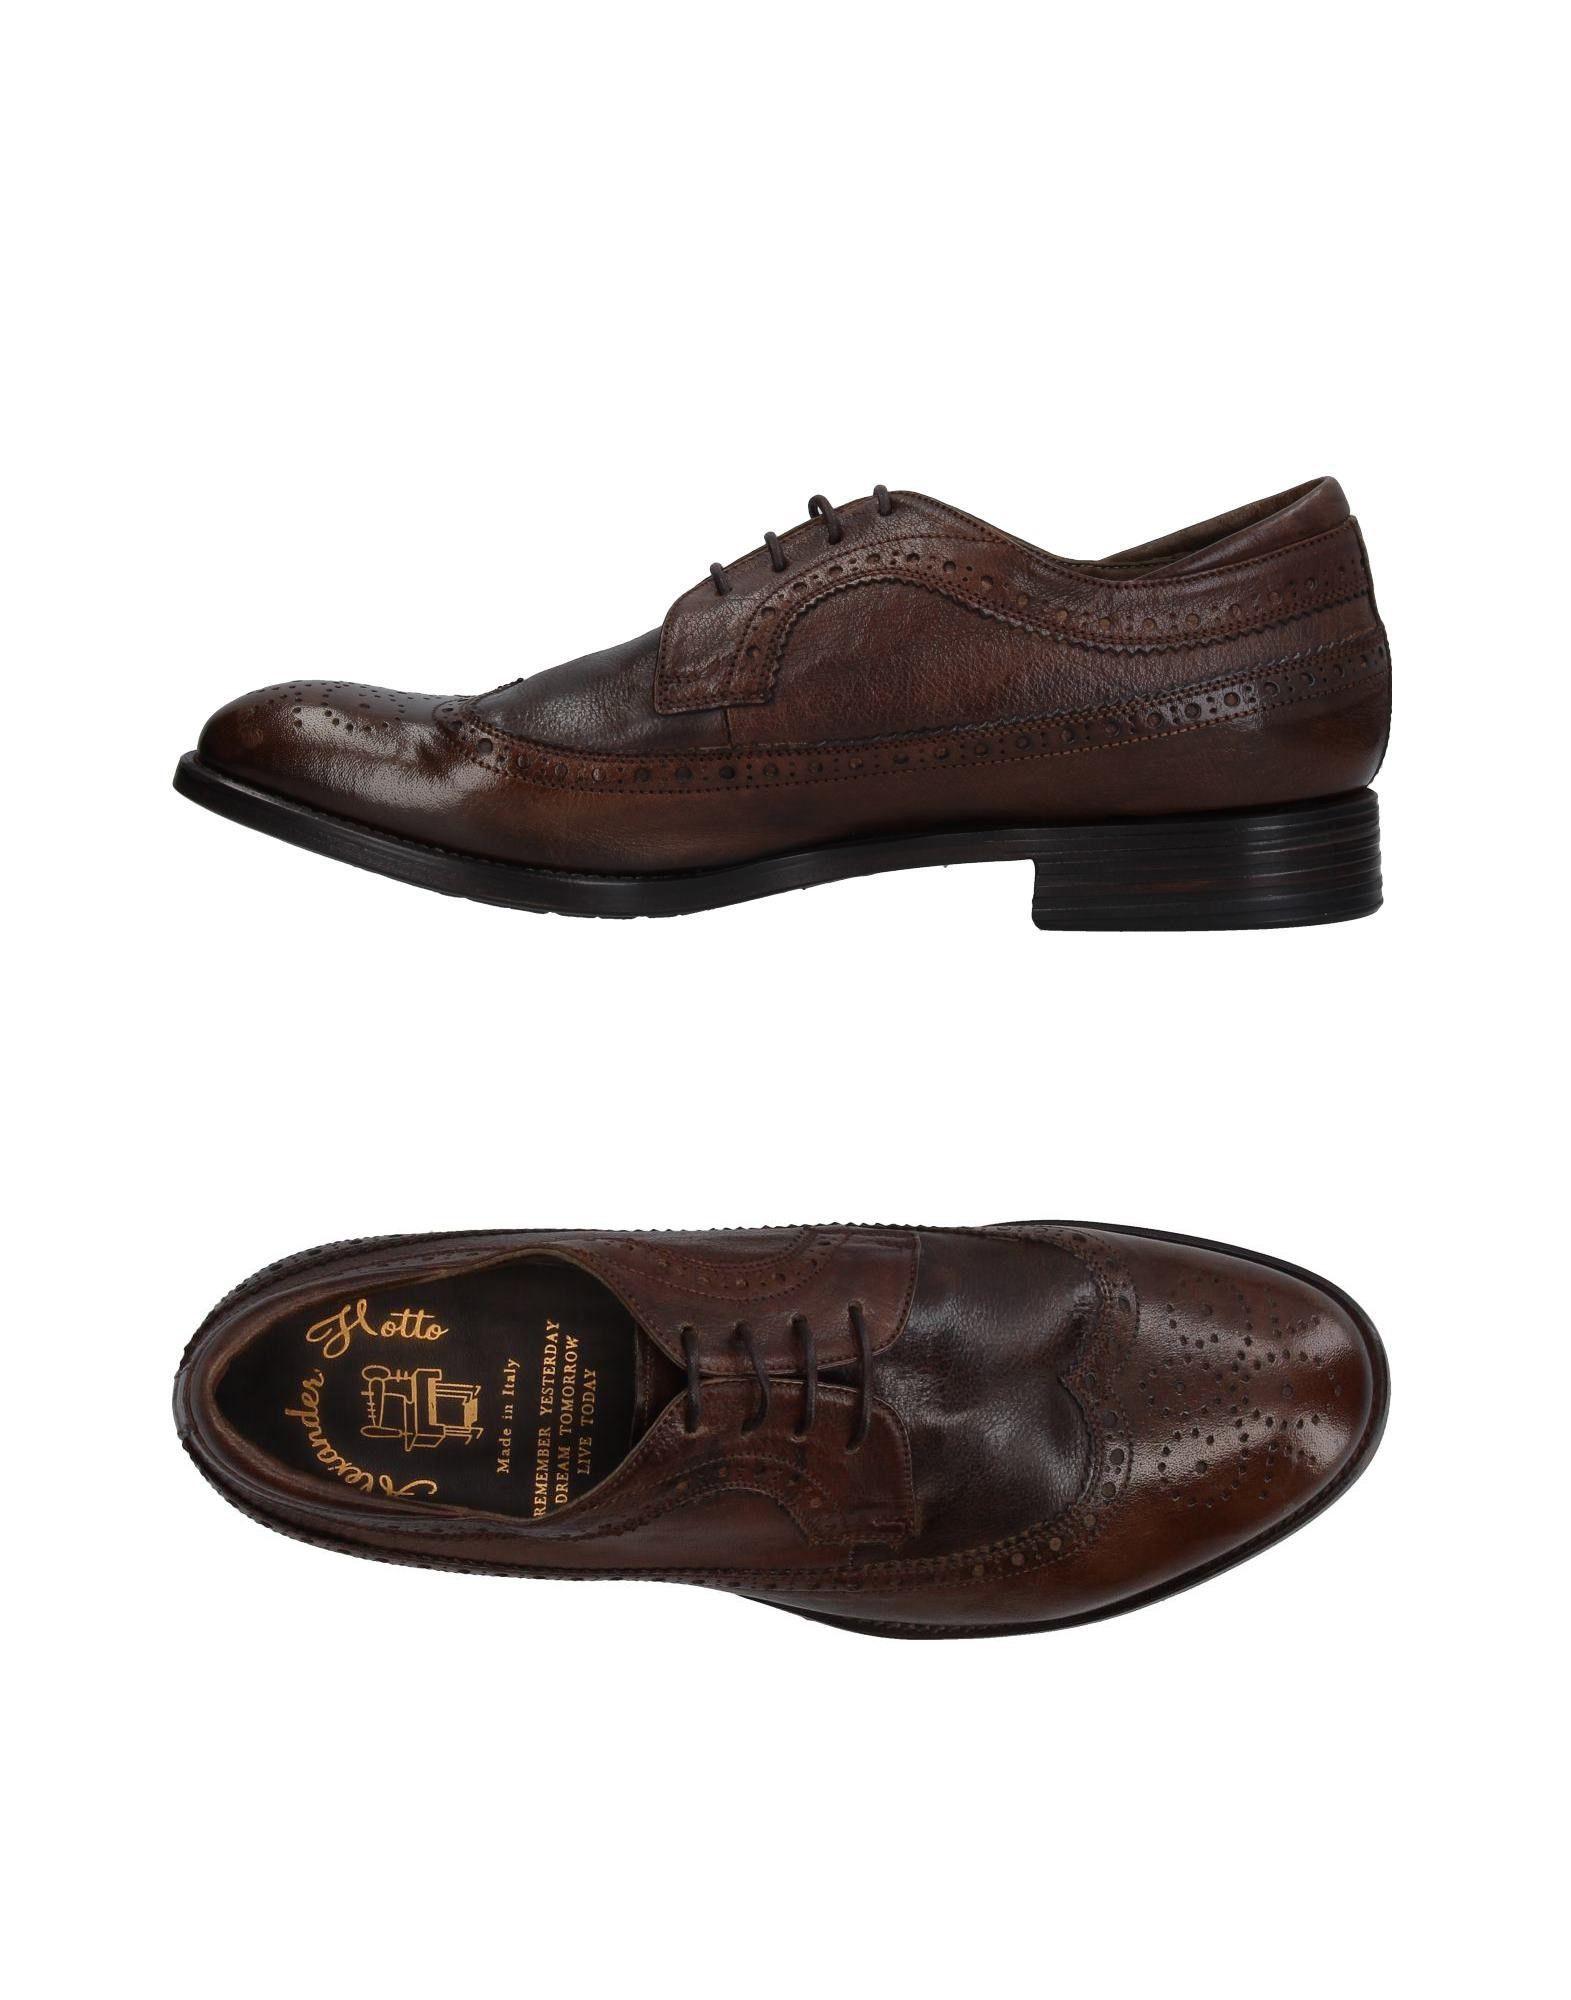 Rabatt echte Schuhe Alexander Hotto Schnürschuhe Herren  11385479QG